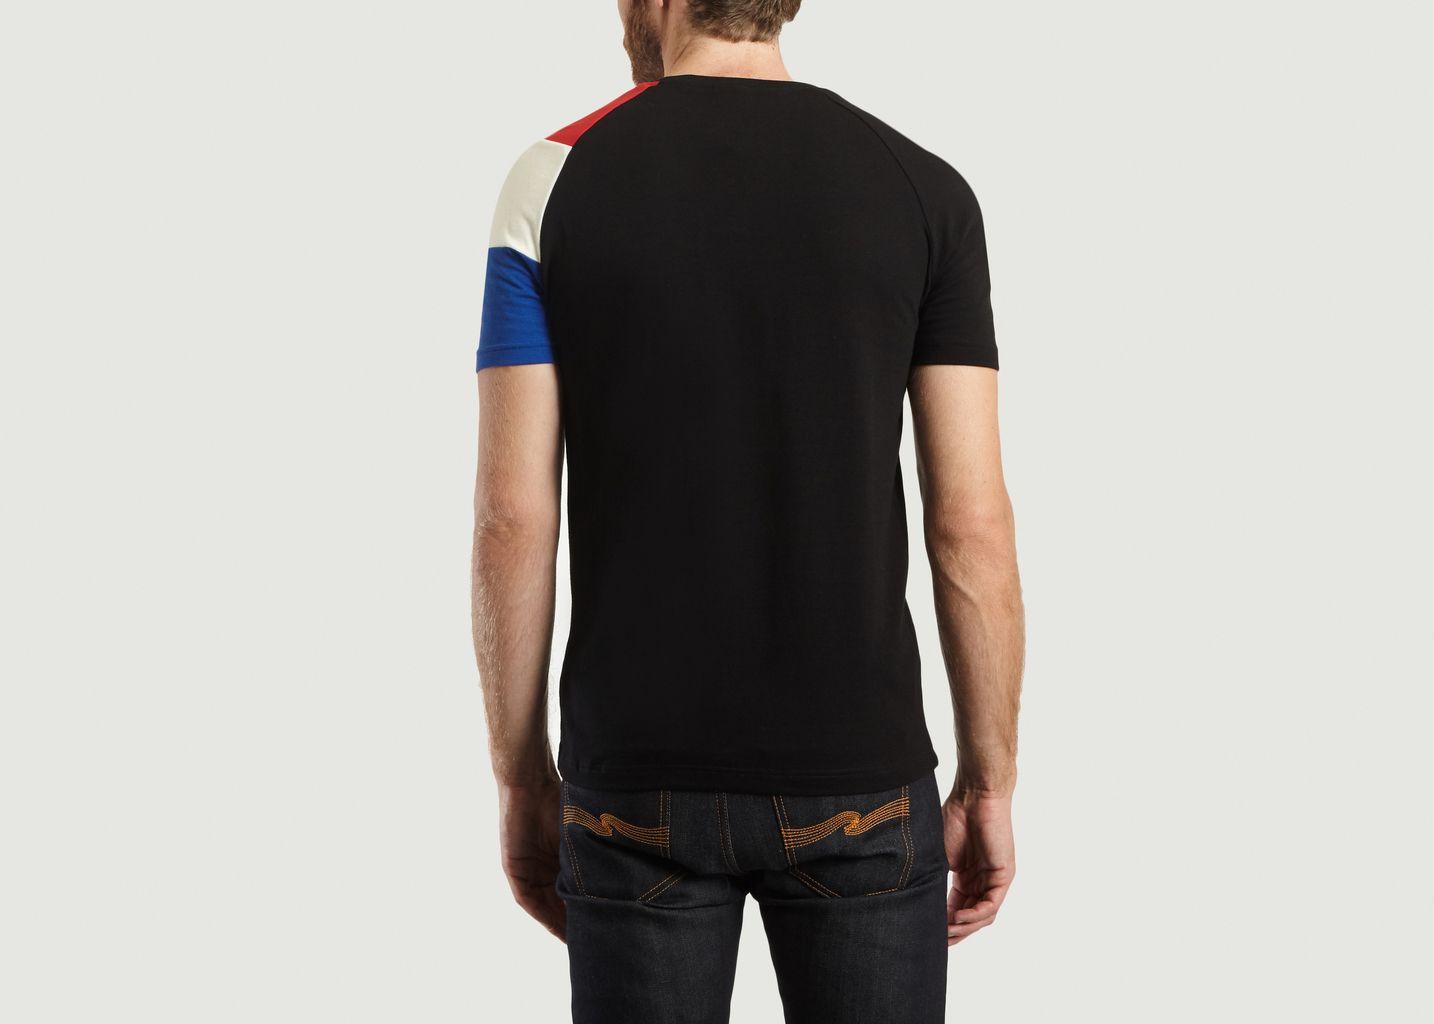 T-Shirt BBR Tri-colore n°2 - Le Coq Sportif